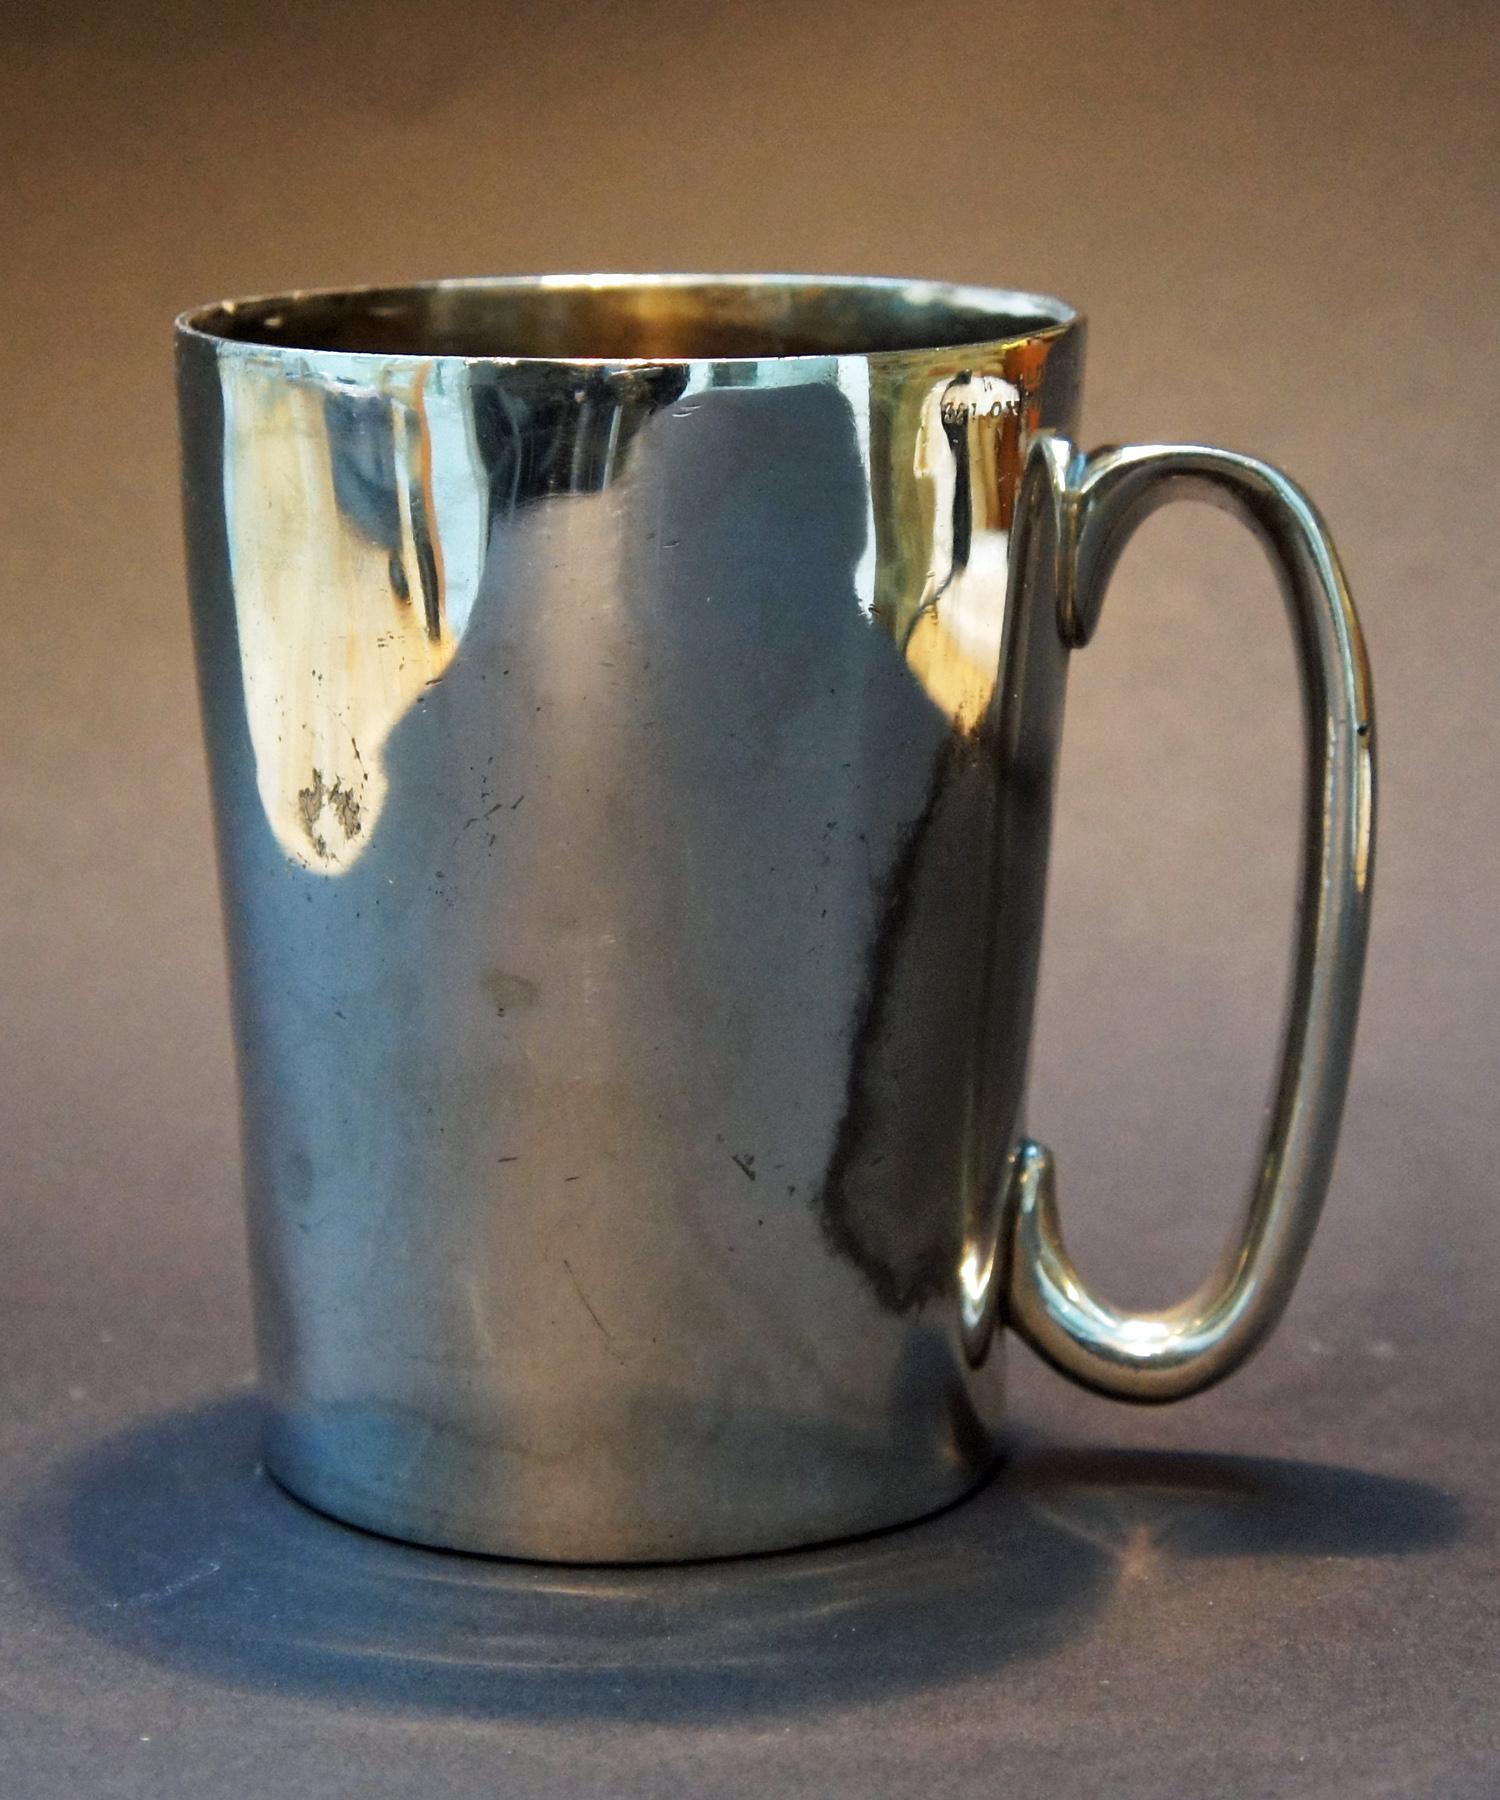 2ecc2bea3a7 More notes towards a history of the beer mug